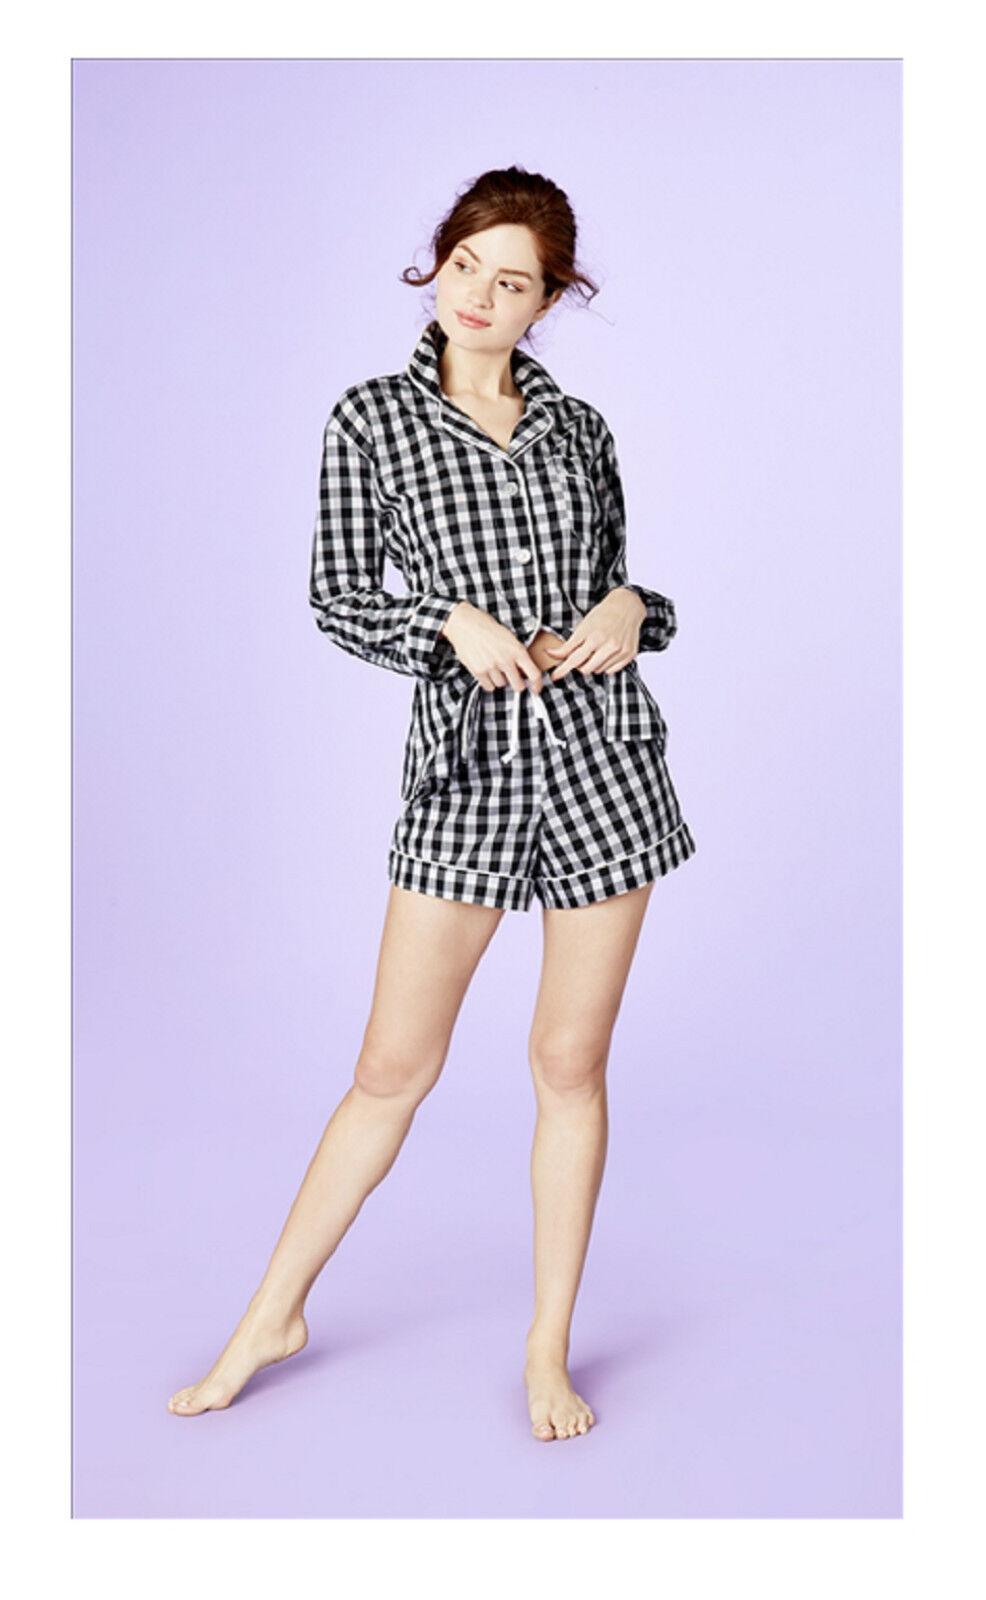 BedHead BedHead BedHead Negro Gingham Algodón L S Clásico Shorty Pijama Conjunto 1177-CF6-5853 dd168d